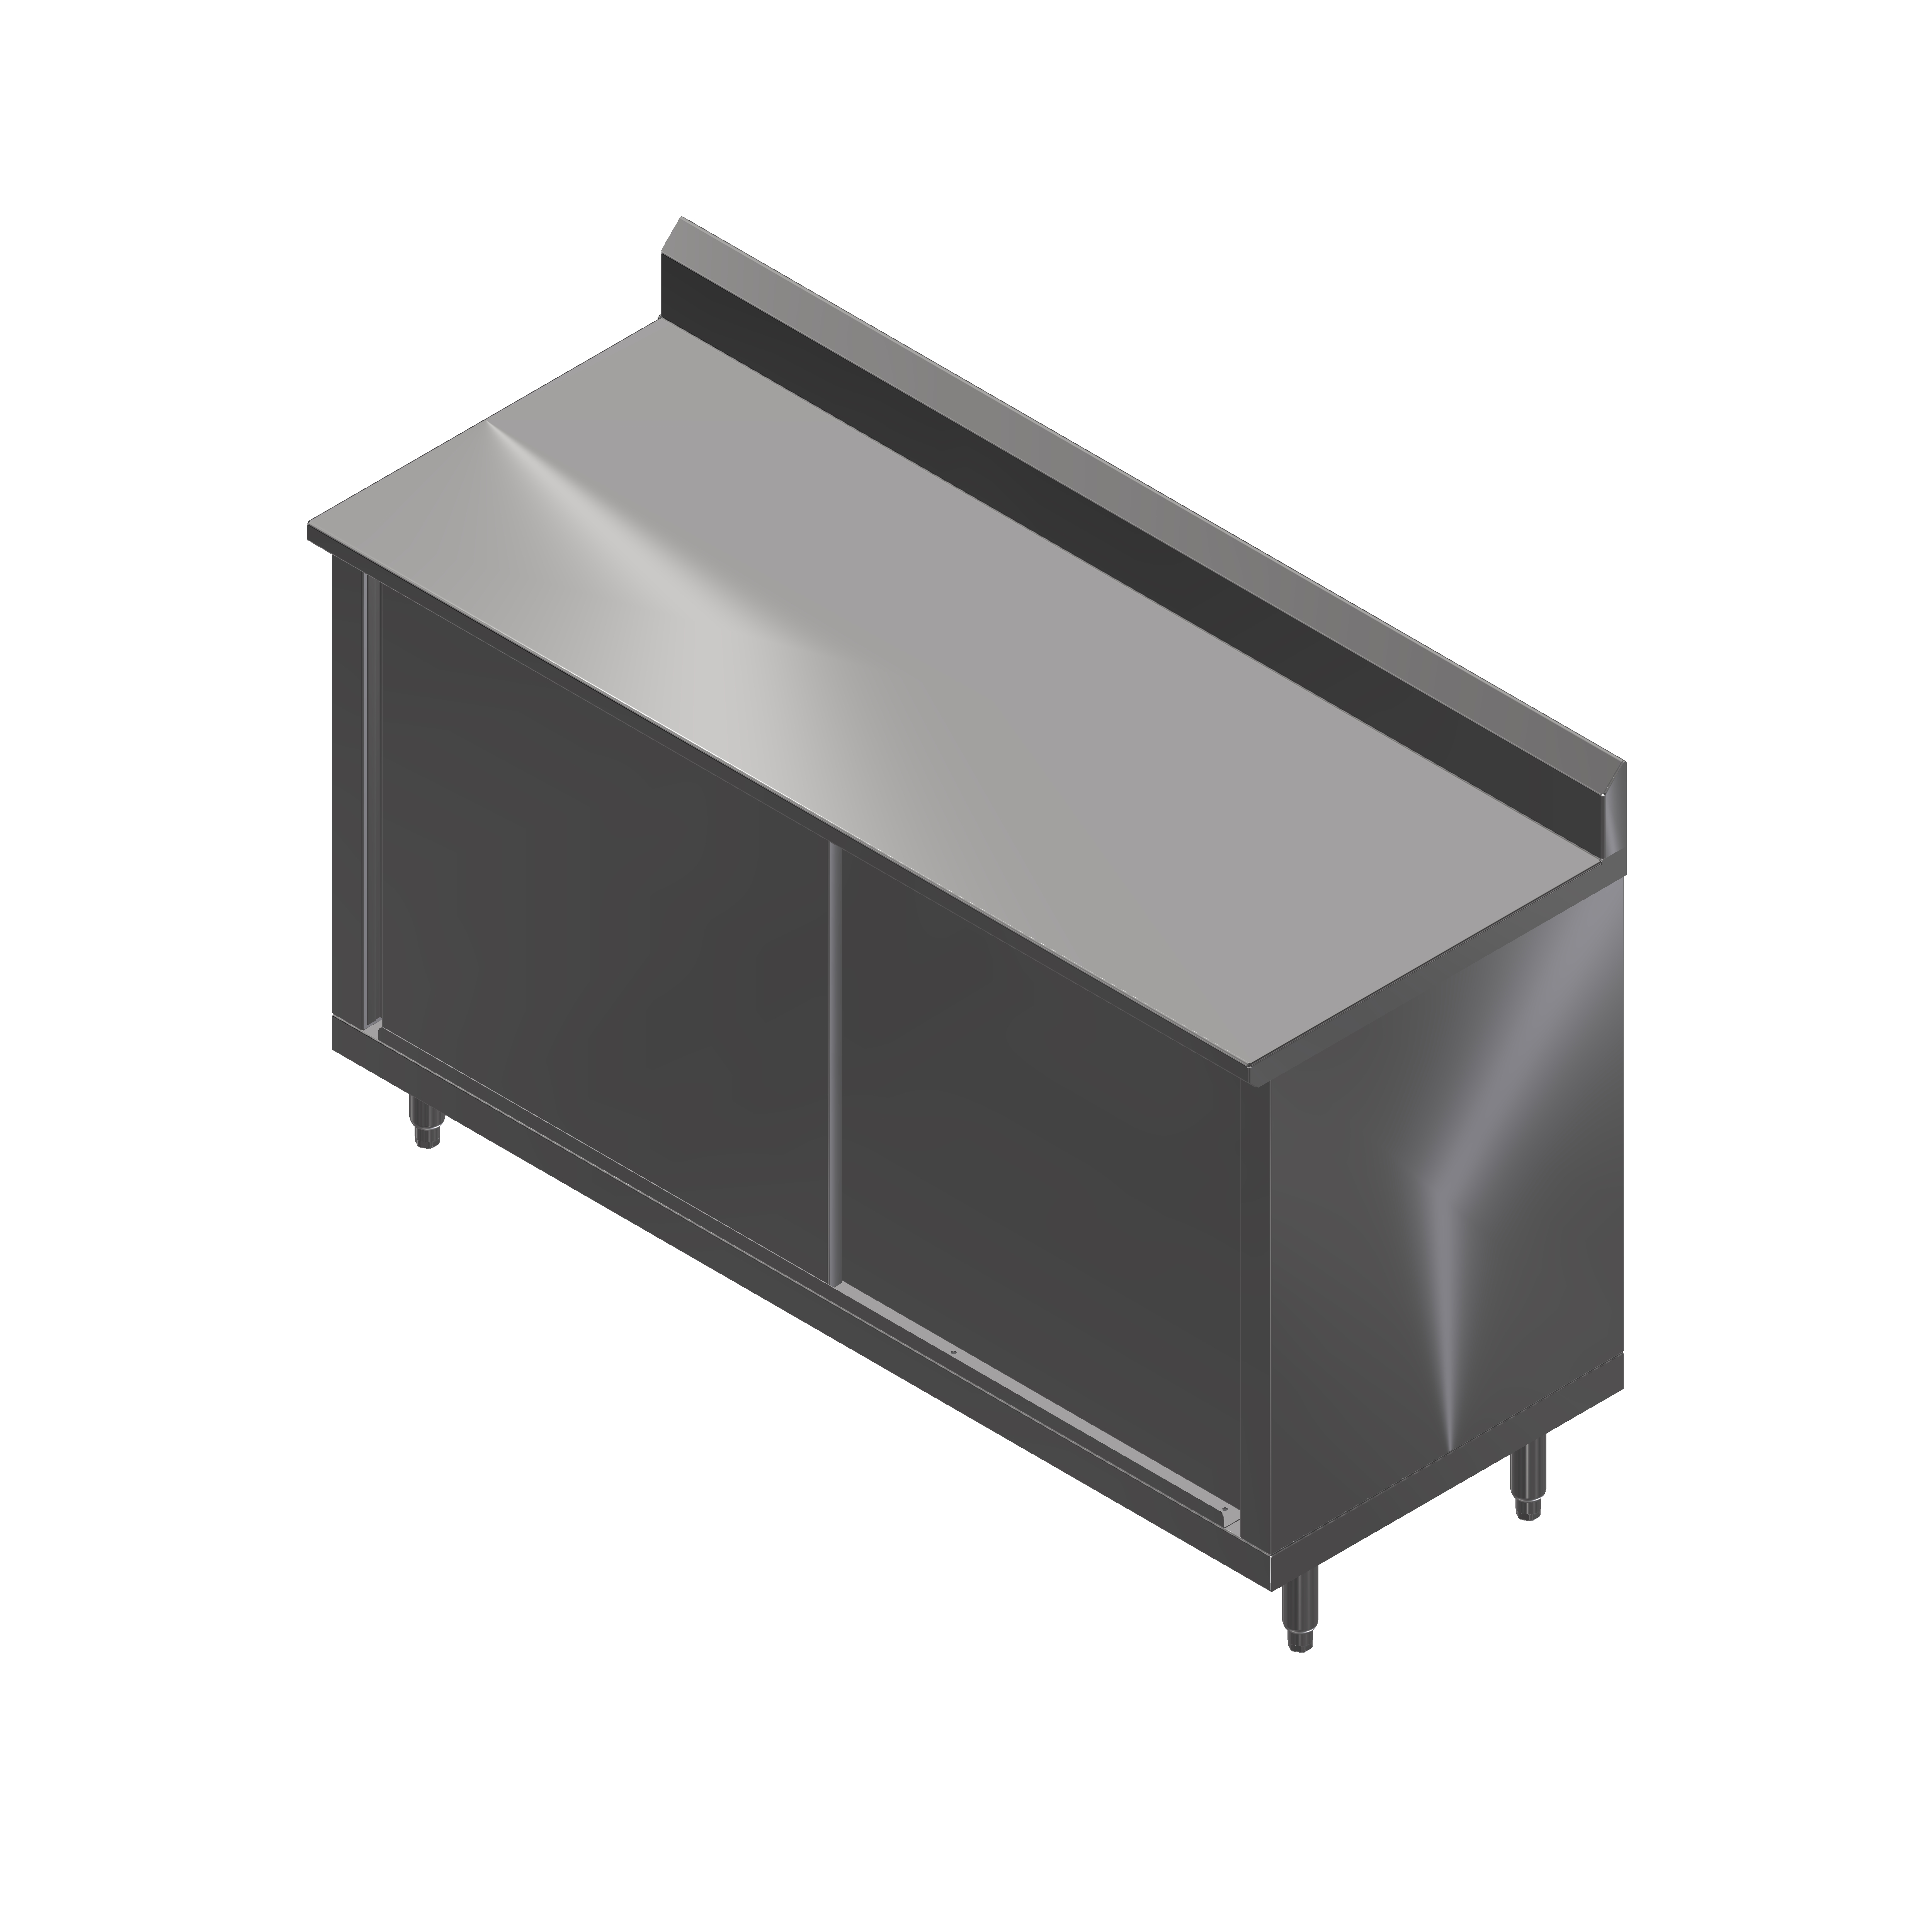 John Boos 4CS4R5-3048 work table, cabinet base sliding doors